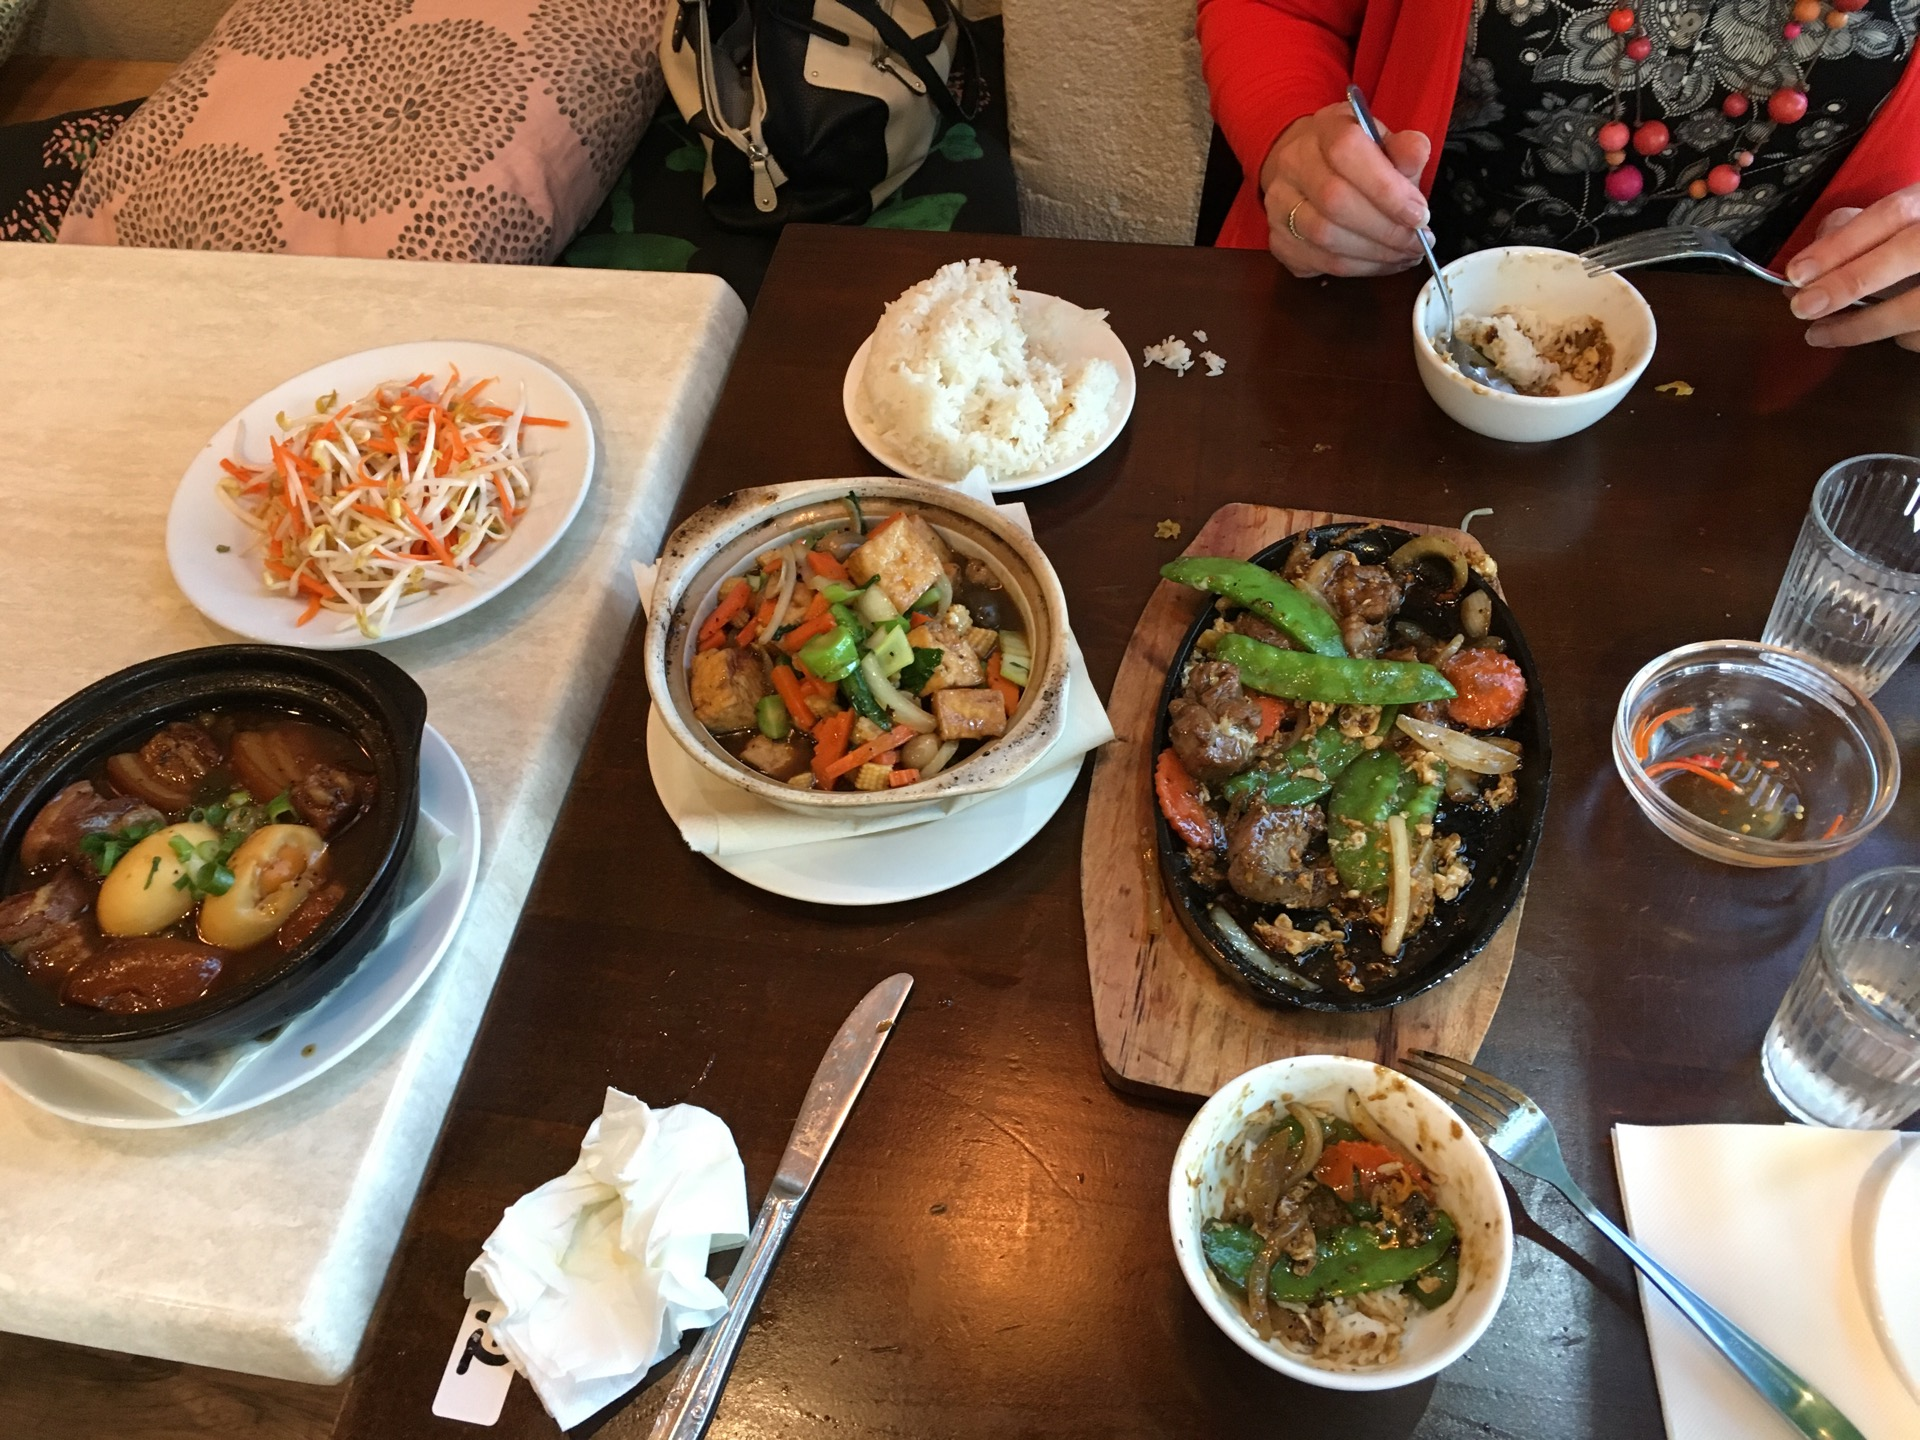 Mui Authentic Vietnamese Restaurant | 423 BAY STREET, BRIGHTON, Victoria 3186 | +61 3 9530 8407